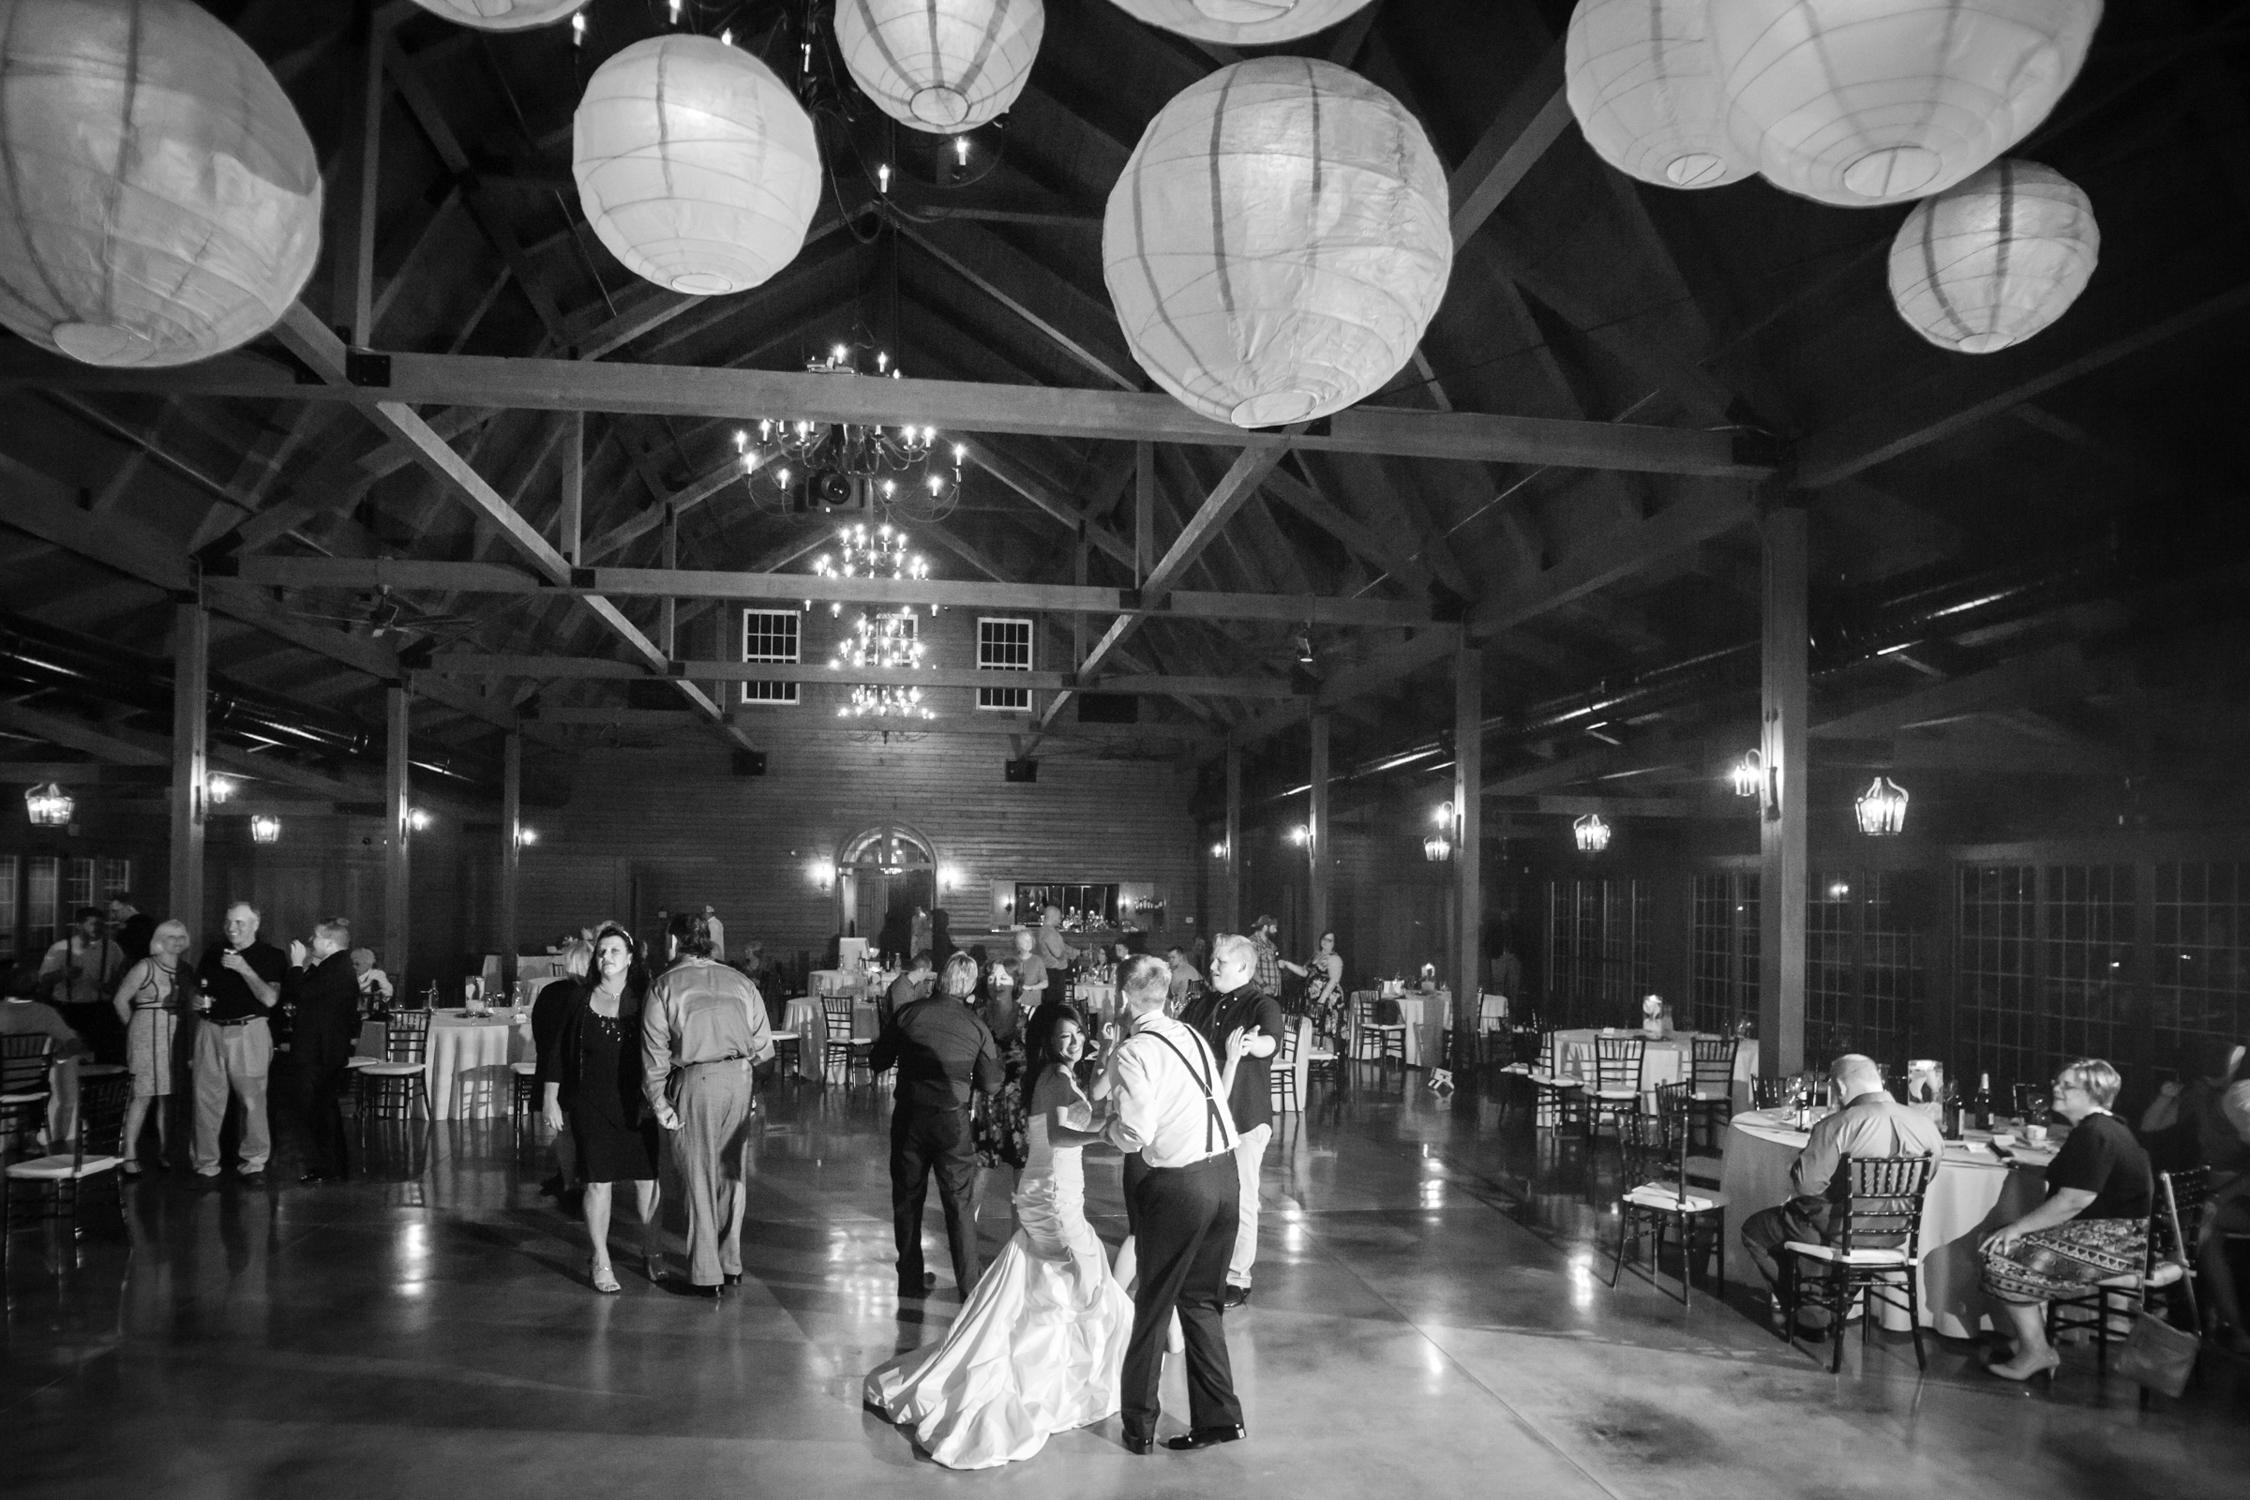 pavilion orchard ridge farms Wedding Photos-61.jpg